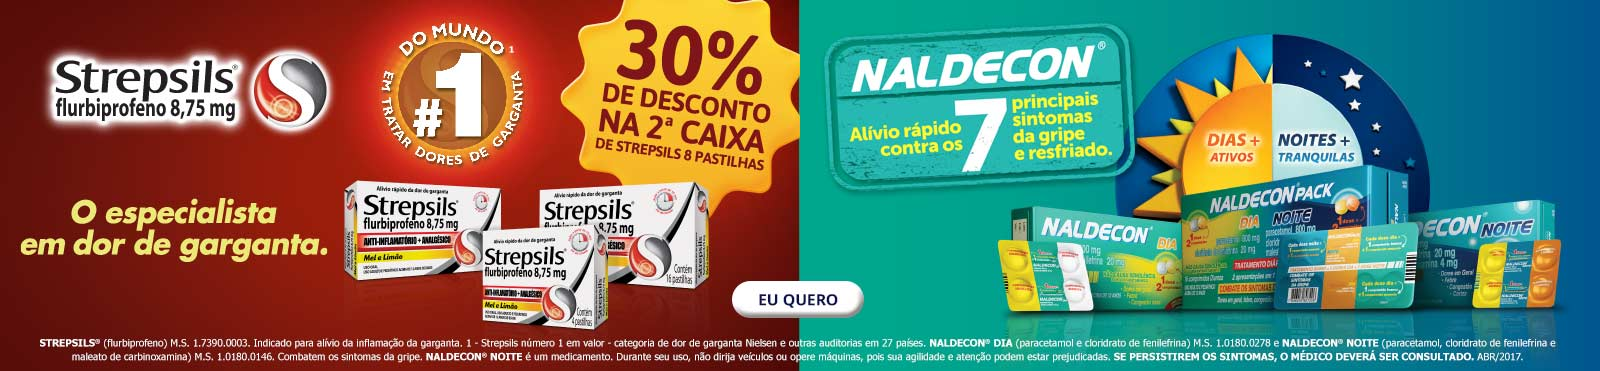 naldecon